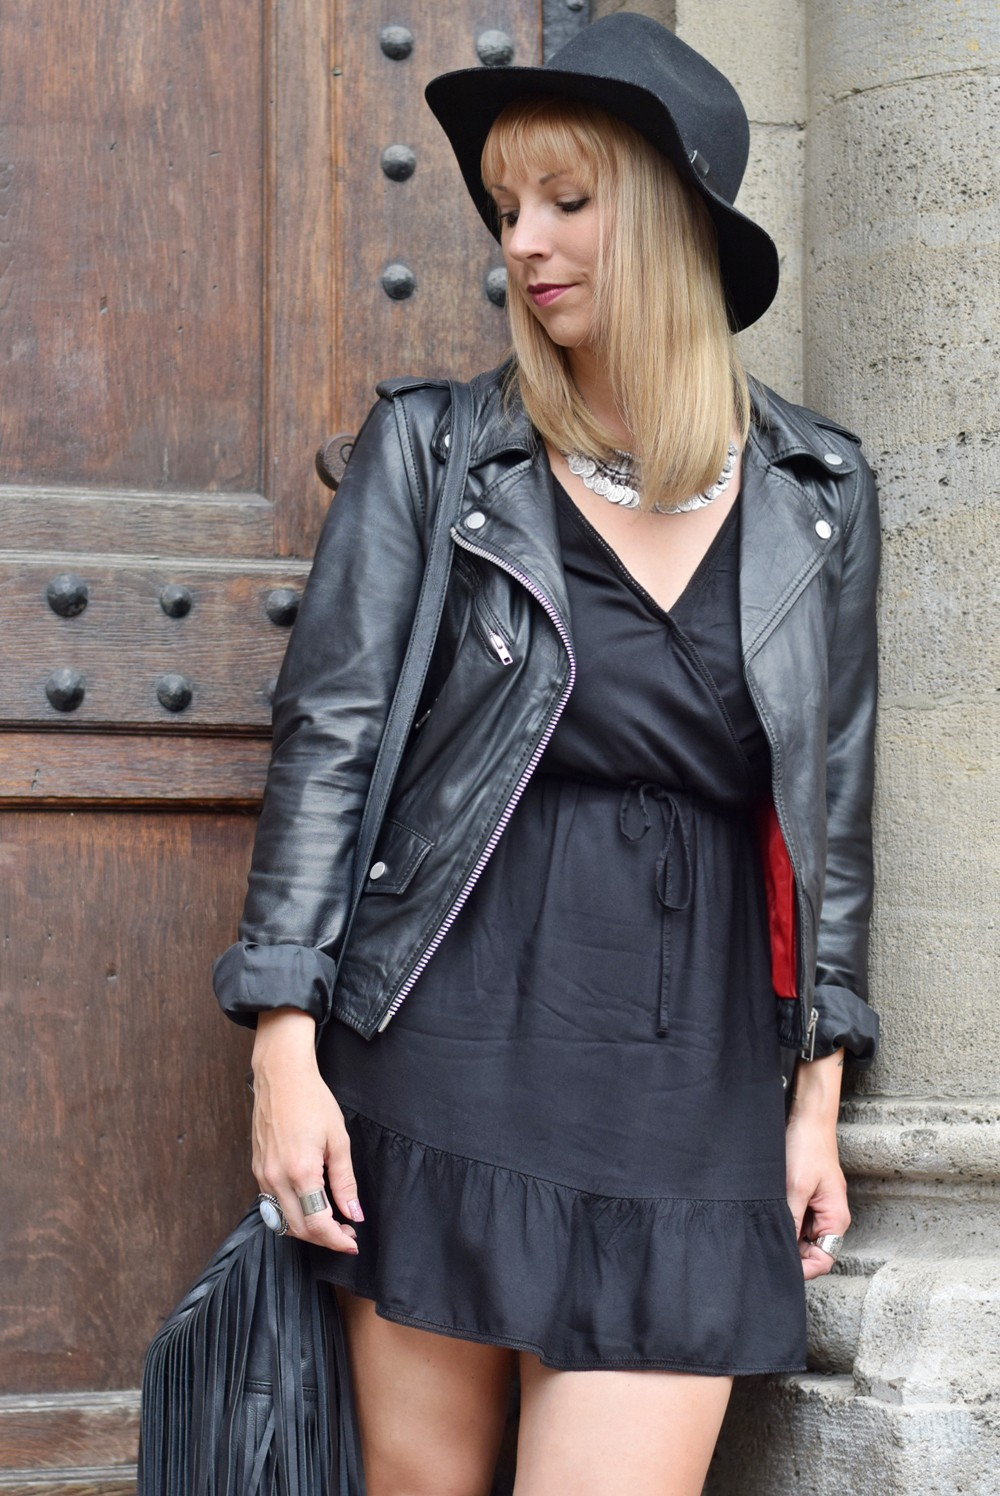 Outfit Bohokleid Fransentasche Lederjacke Hut Bikerboots 7